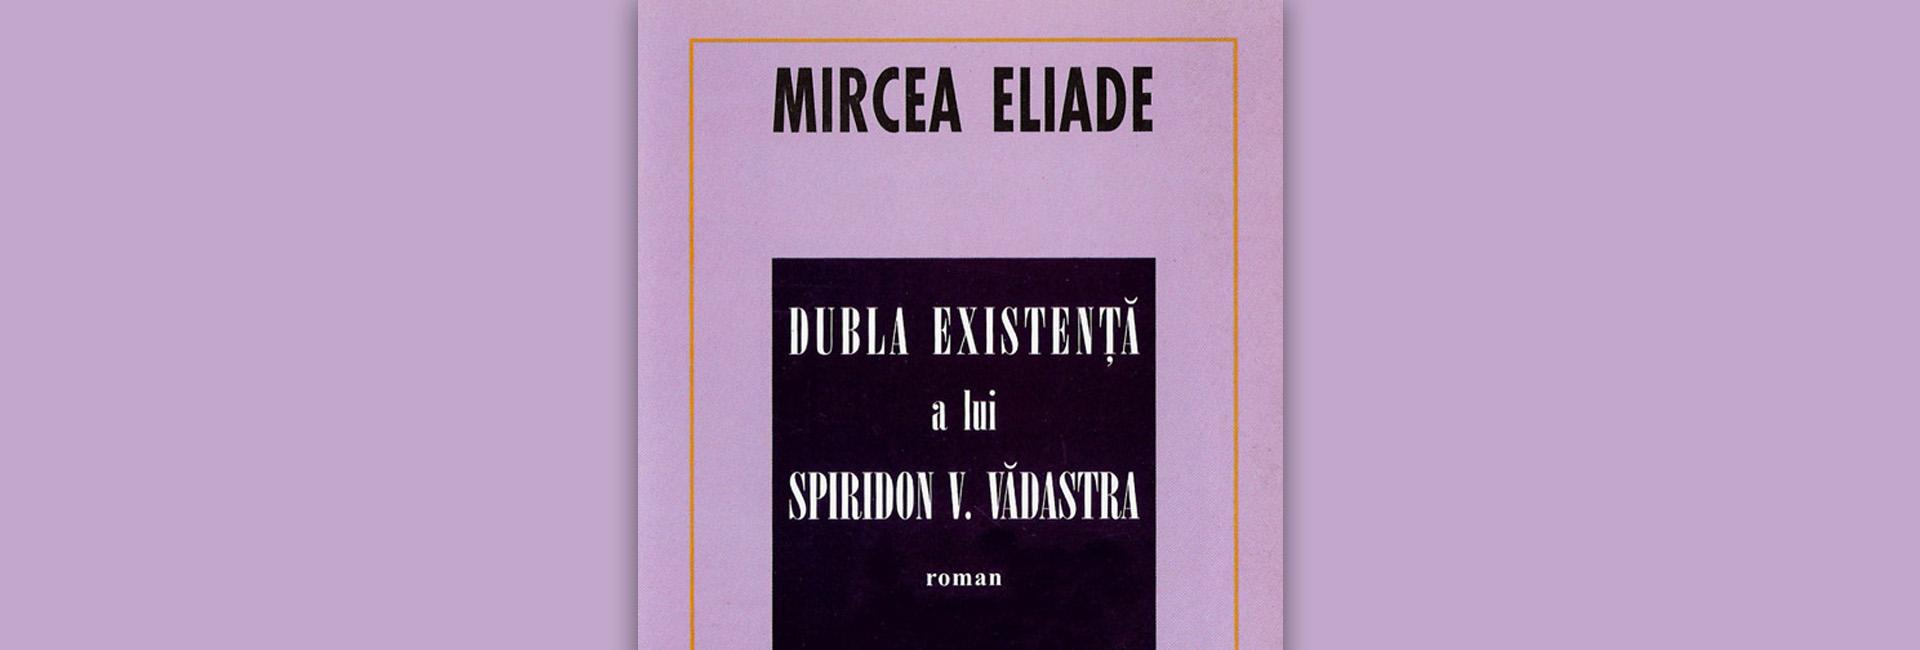 recenzie Mircea Eliade Dubla Existență a lui Spiridon V. Vădastra roman